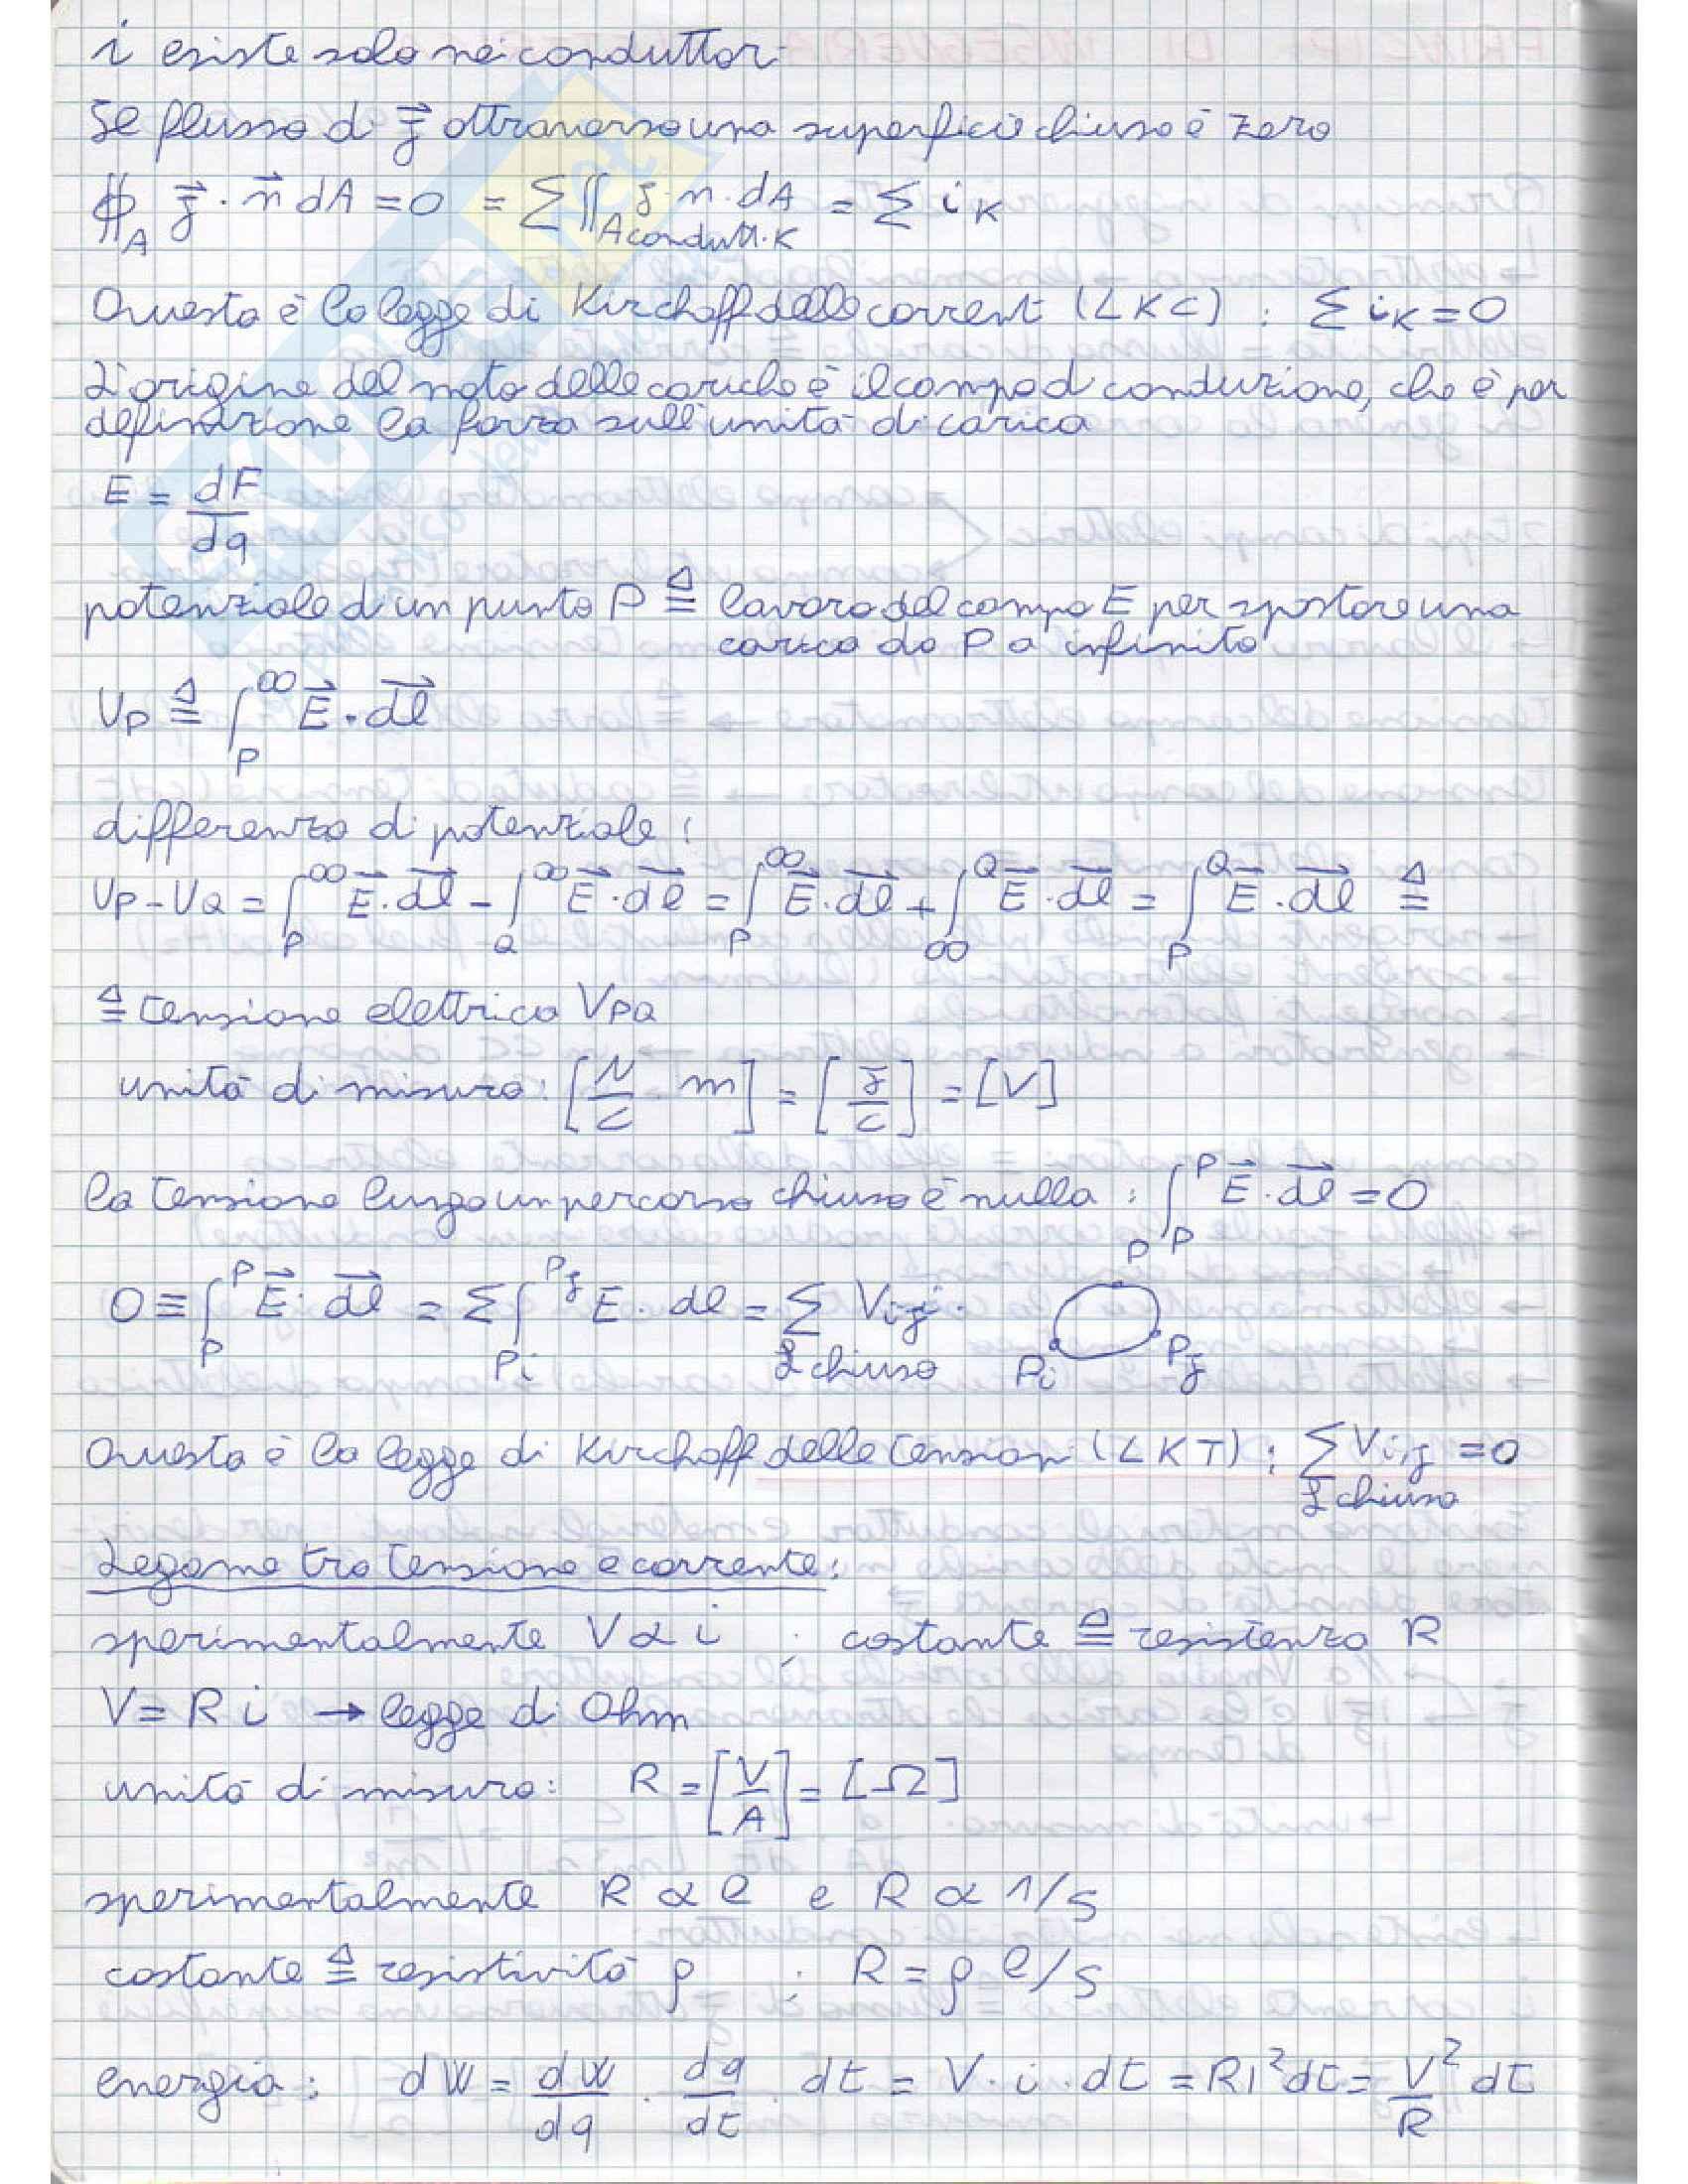 Principi di ingegneria elettrica - Appunti Pag. 2